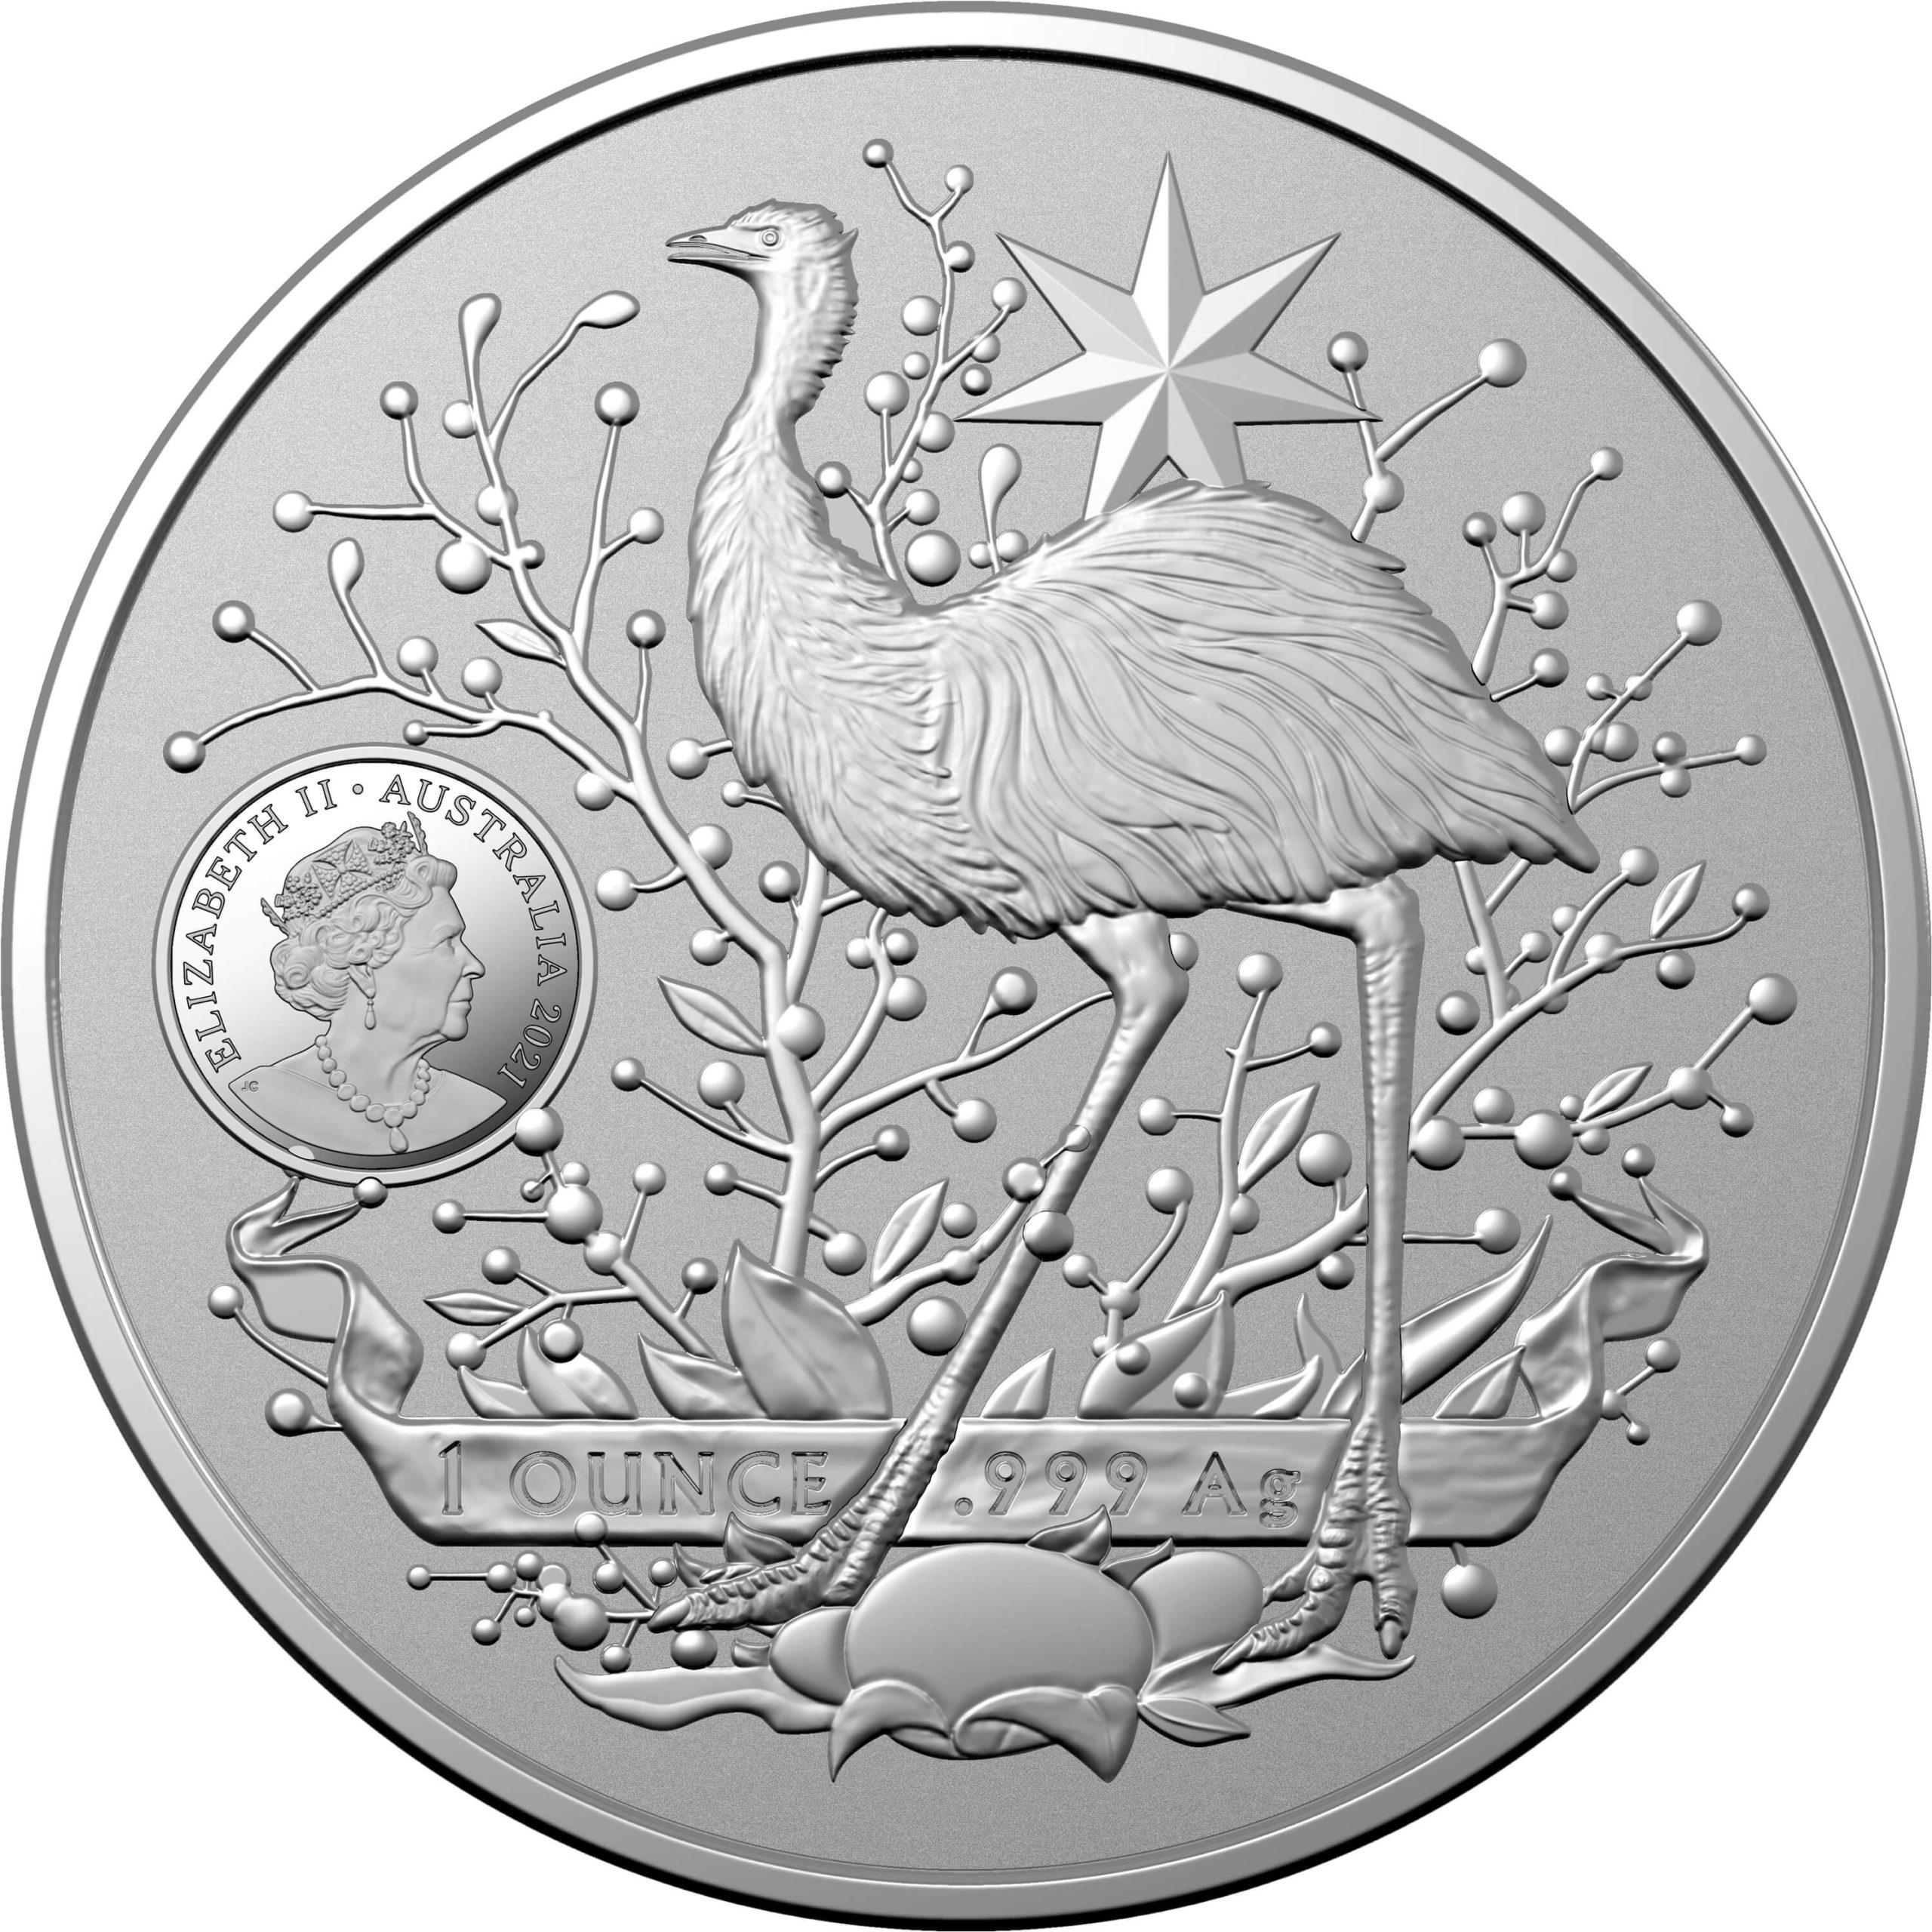 2021 Australia's Coat of Arms 1oz .999 Silver Bullion Coin 2